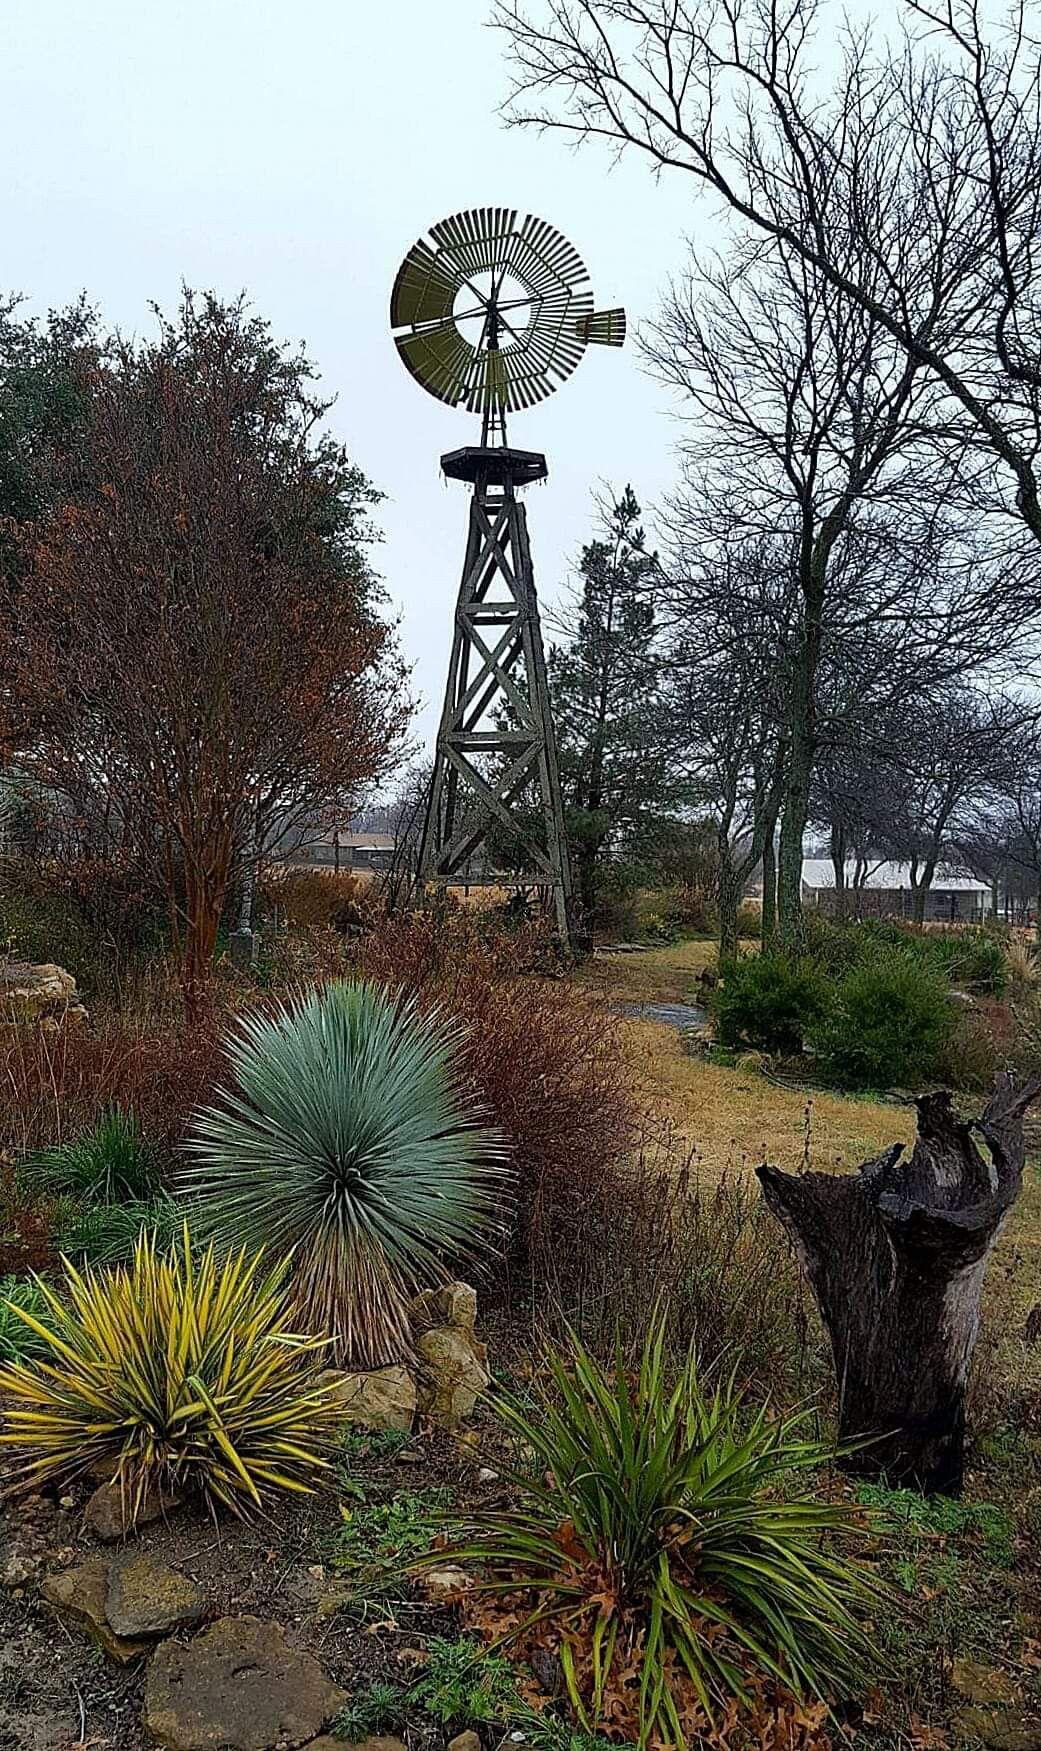 A wind pump in Decatur, Texas | Don Quixote's Nightmare in